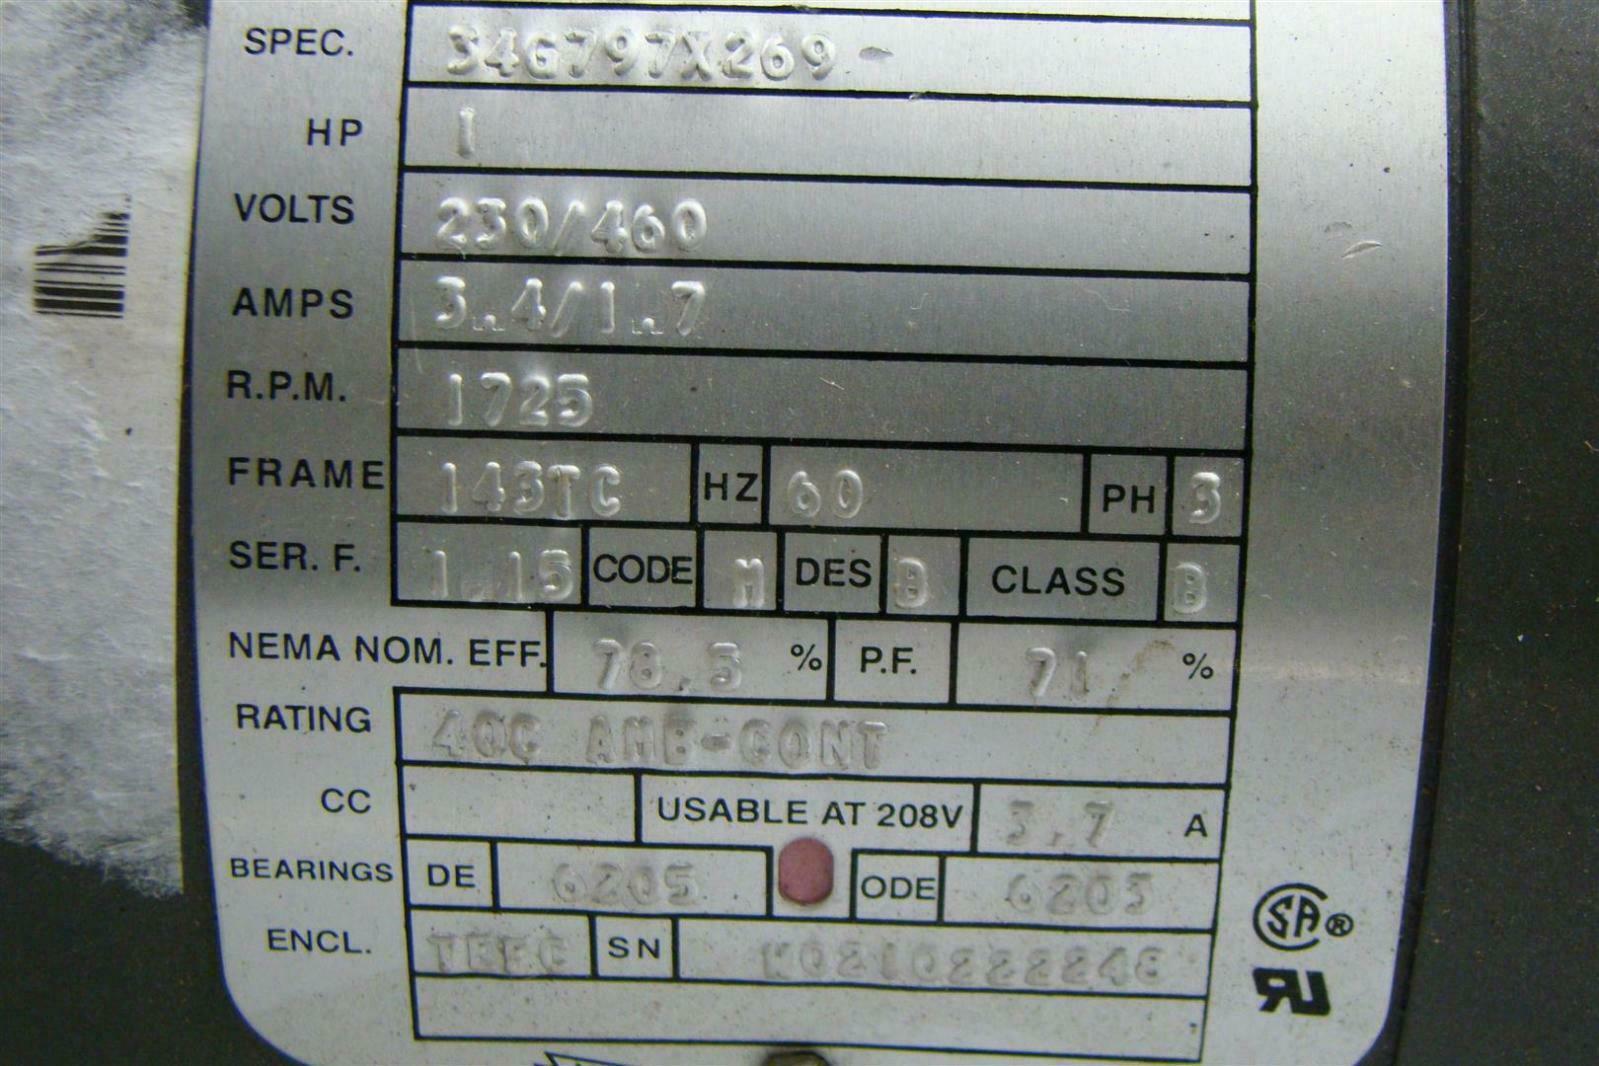 Electricric Motor 1 Hp 230 460V 1.7A 2.25 X.878 Shaft P3  #404862